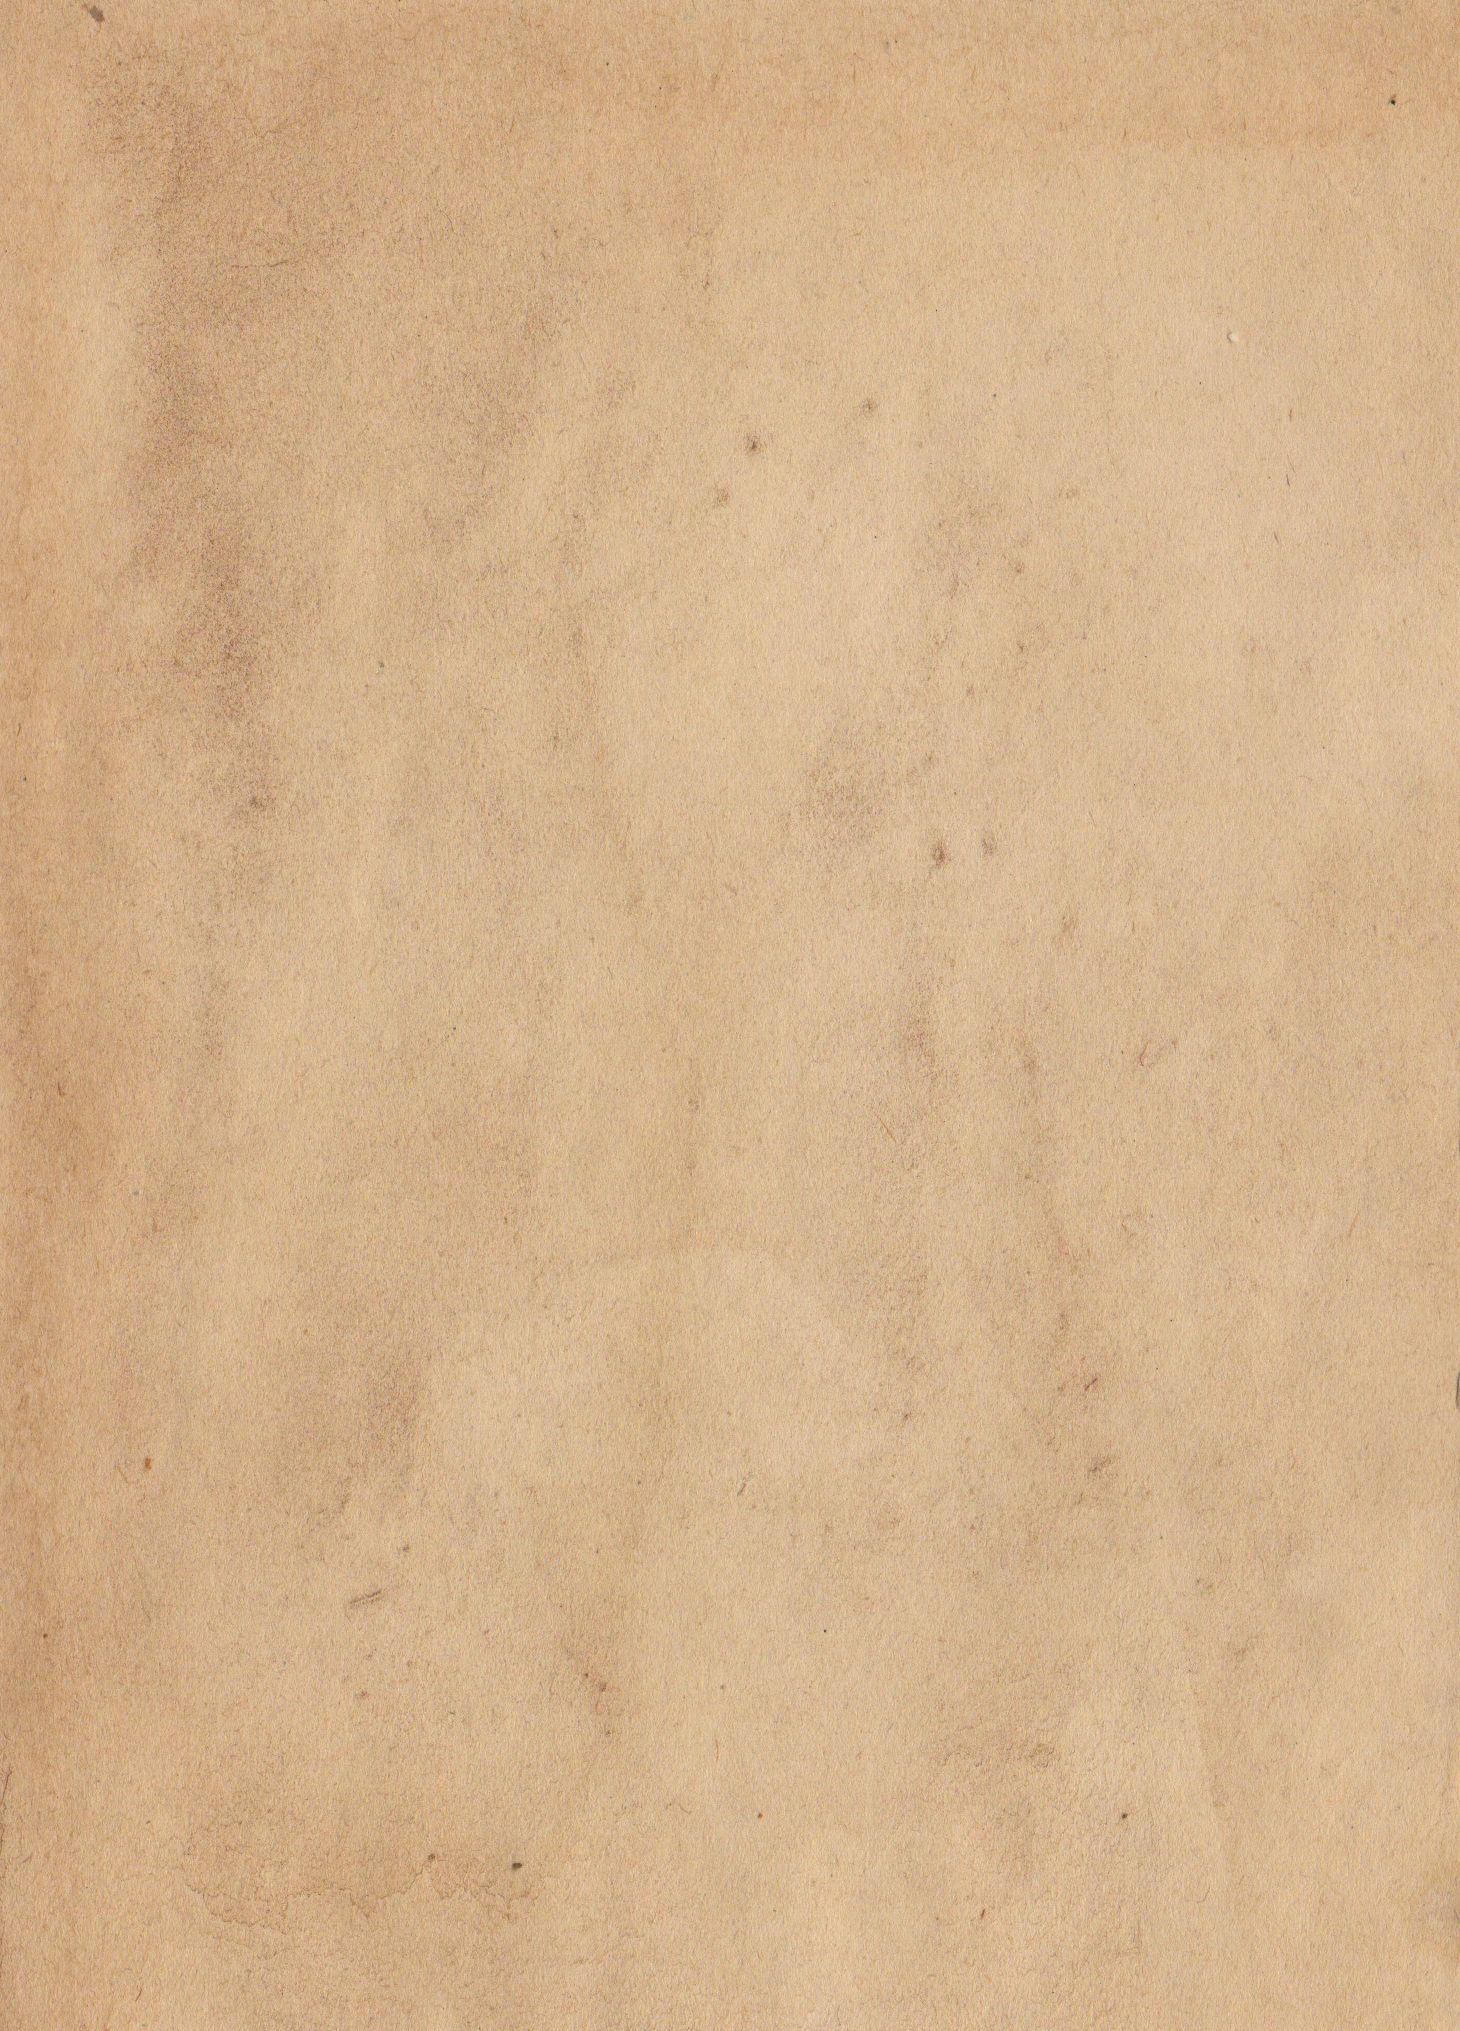 Free 20th Century Brown Vintage Paper Texture L T Vintage Paper Textures Paper Texture Vintage Paper